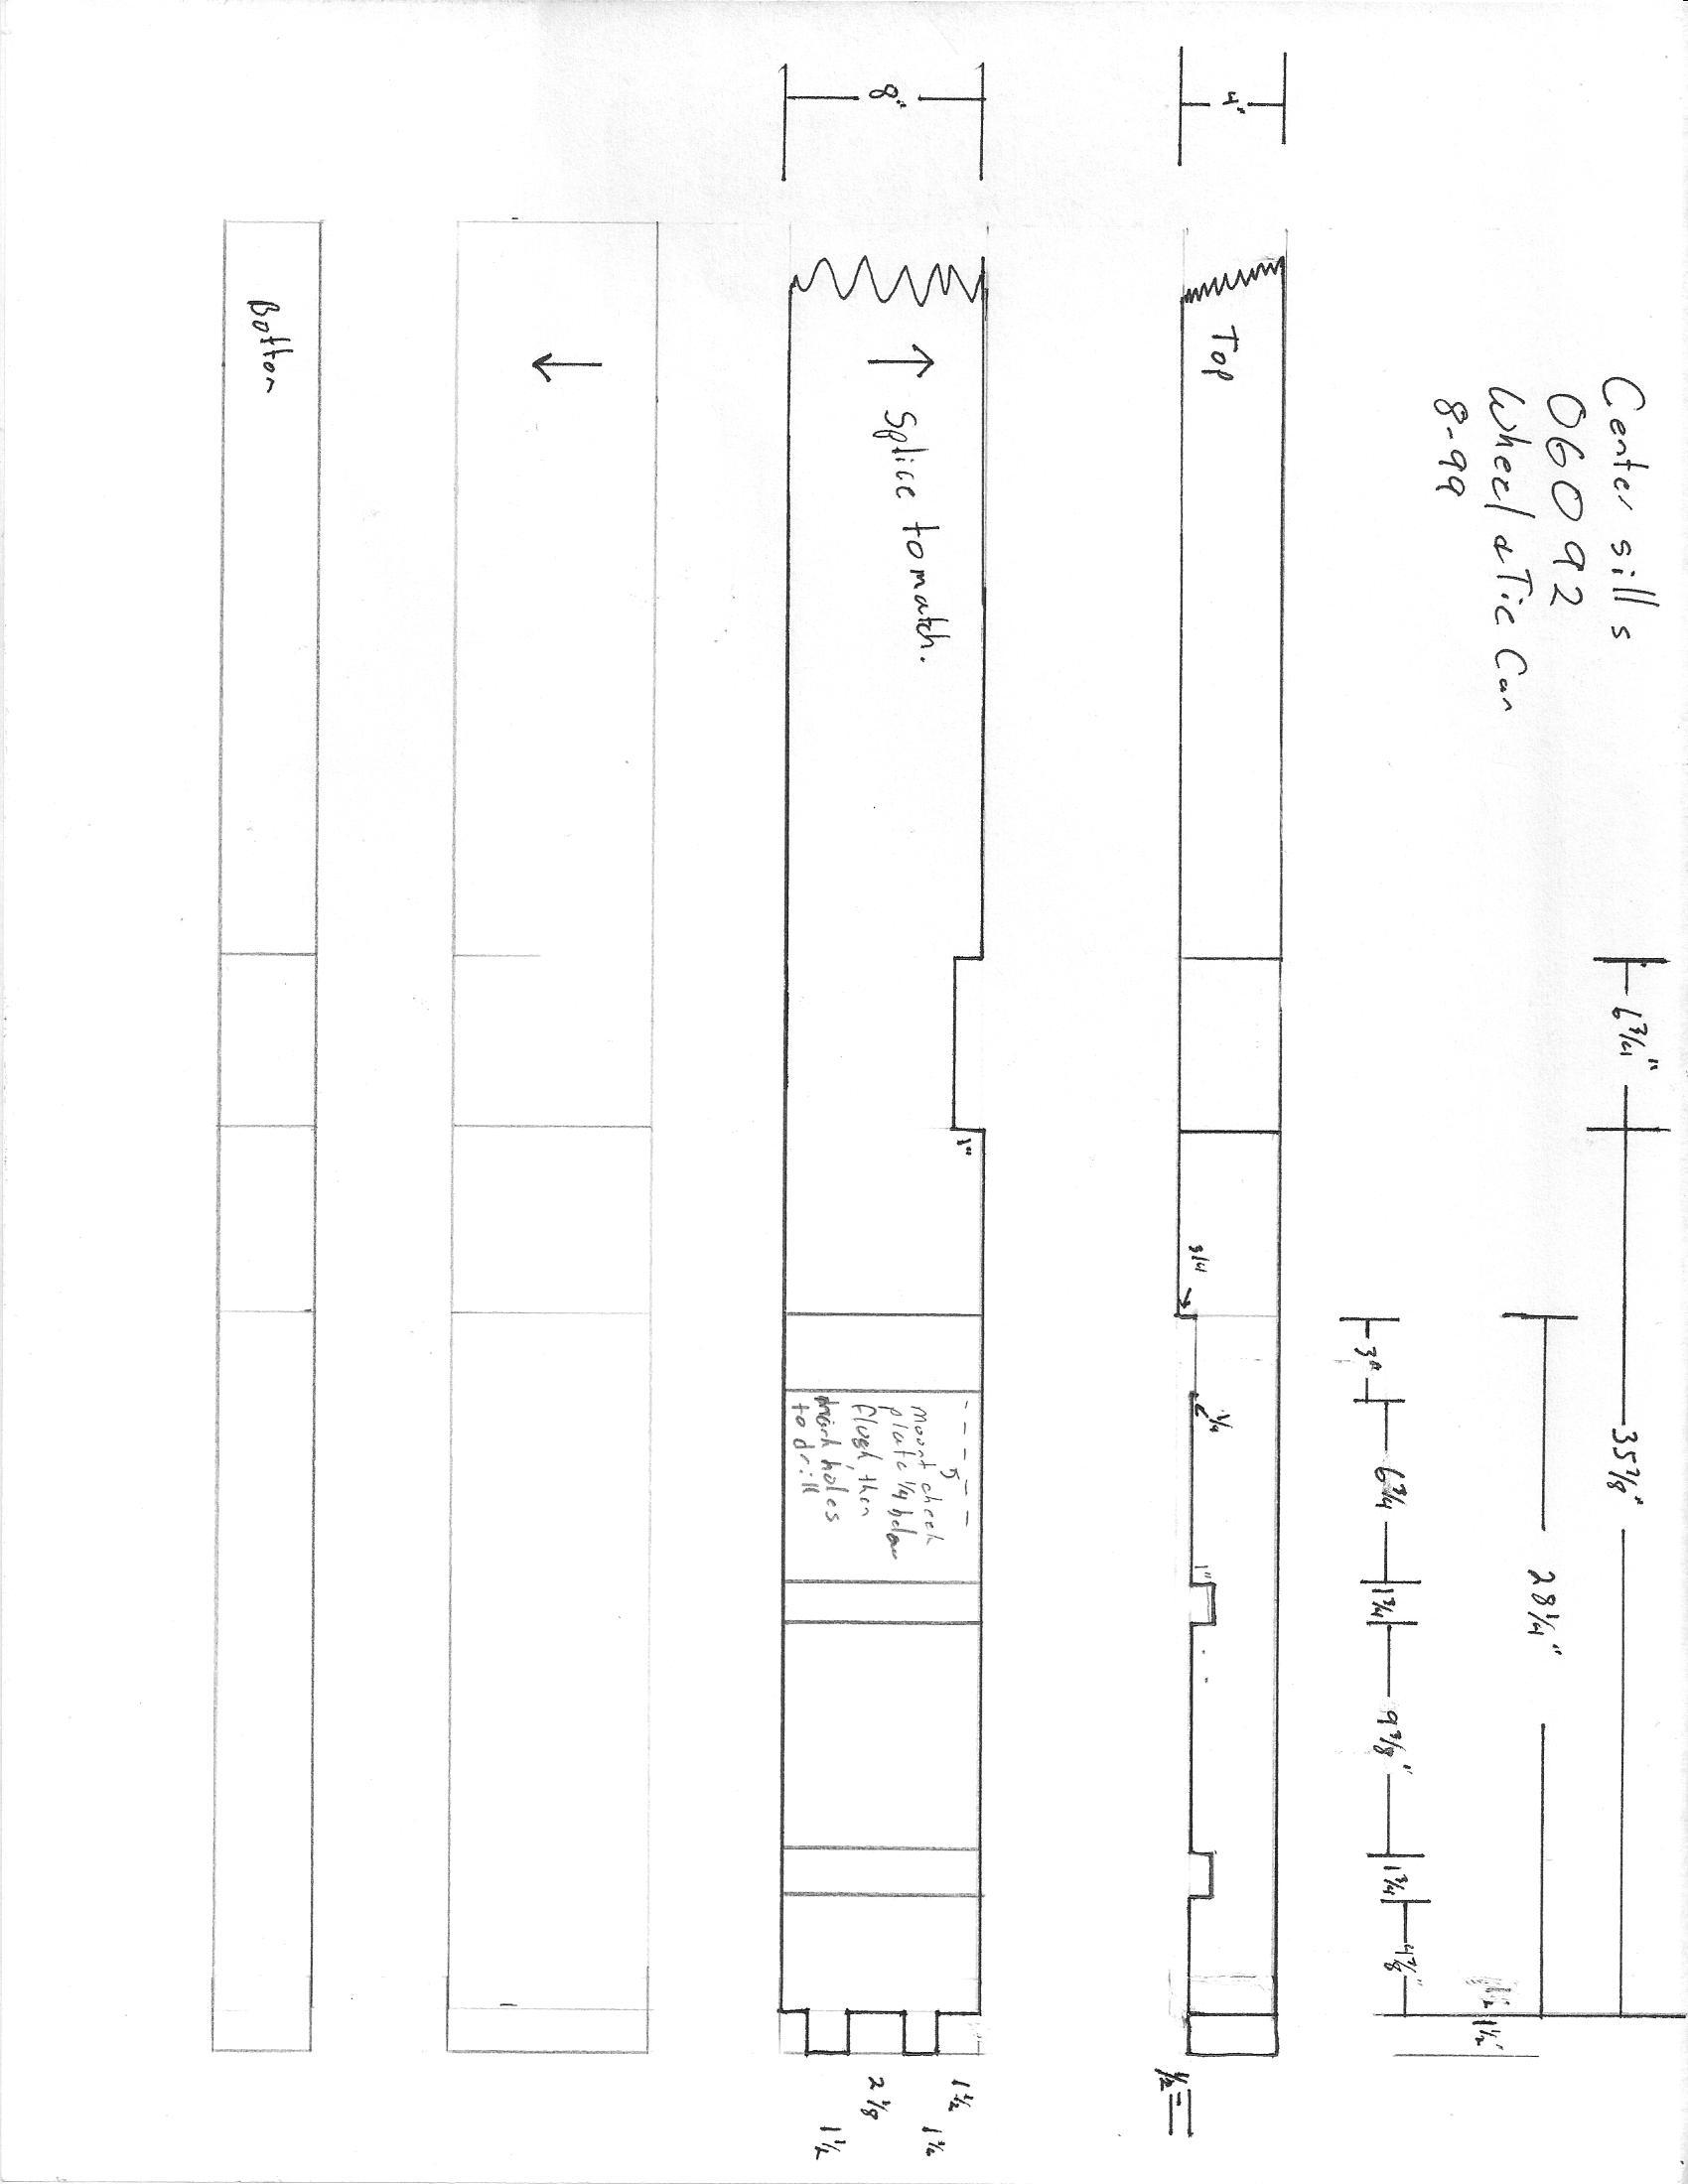 06092 draft timbers.jpg